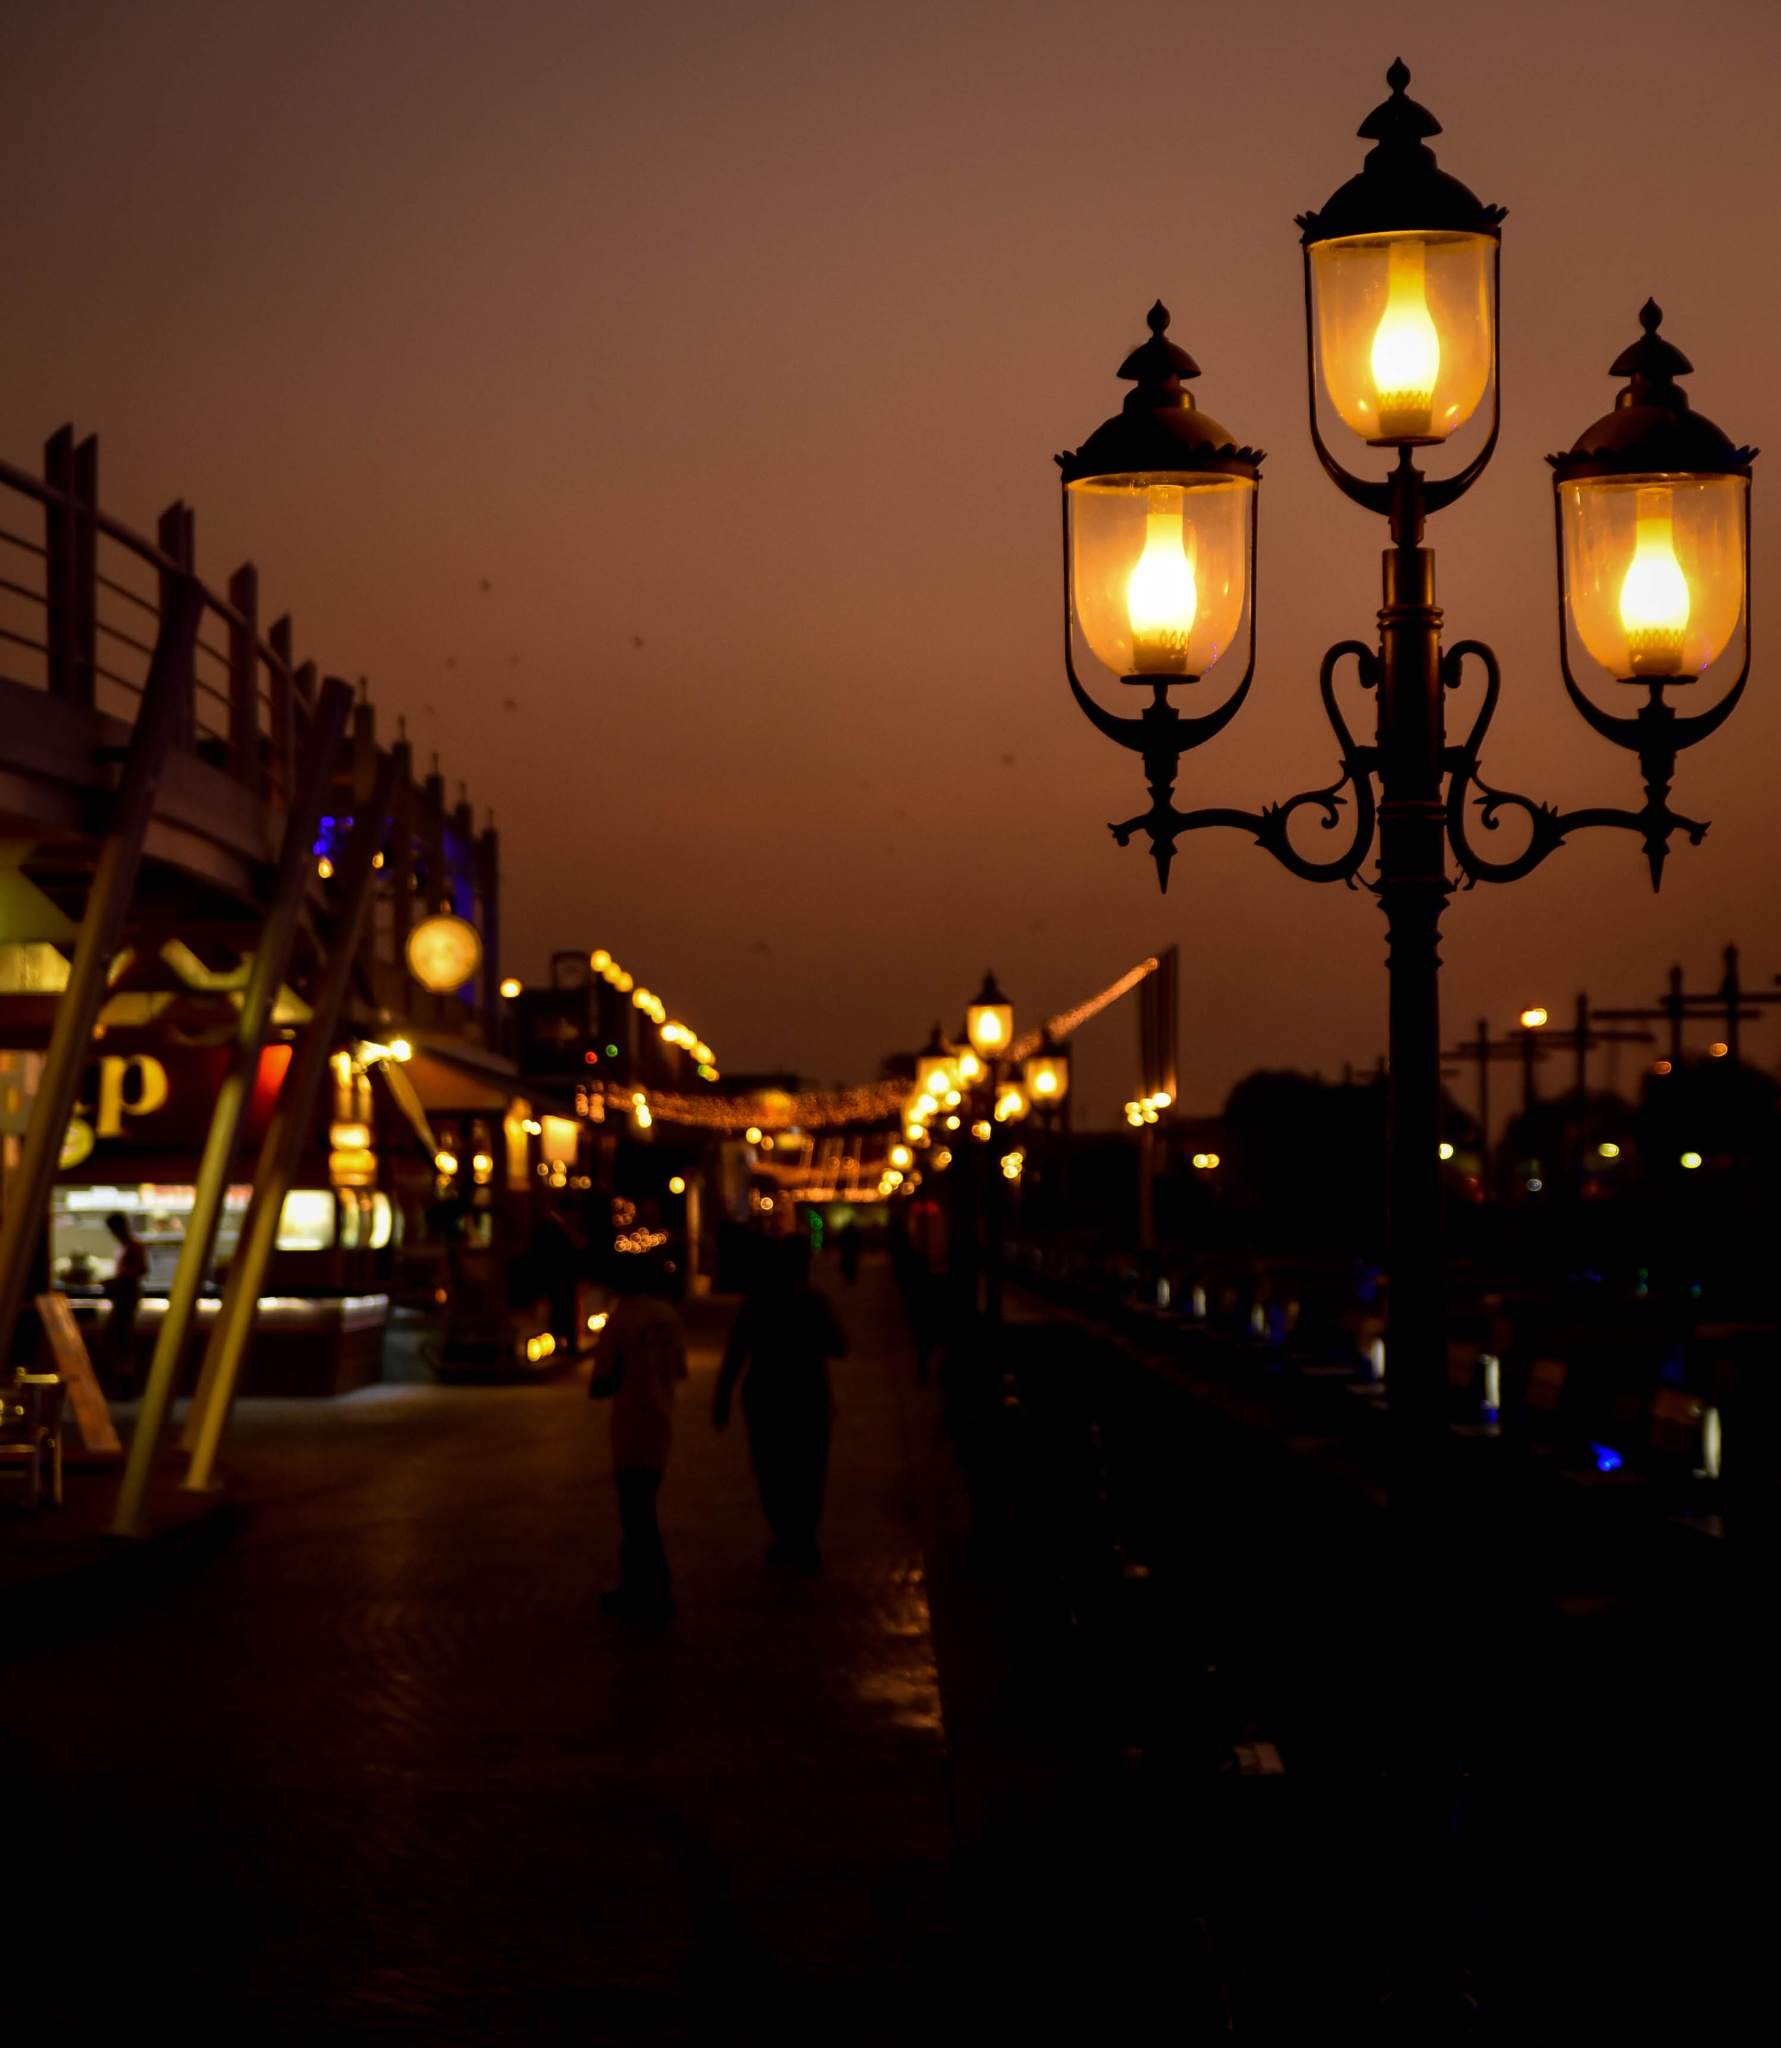 Port Grand by NaumanMughal